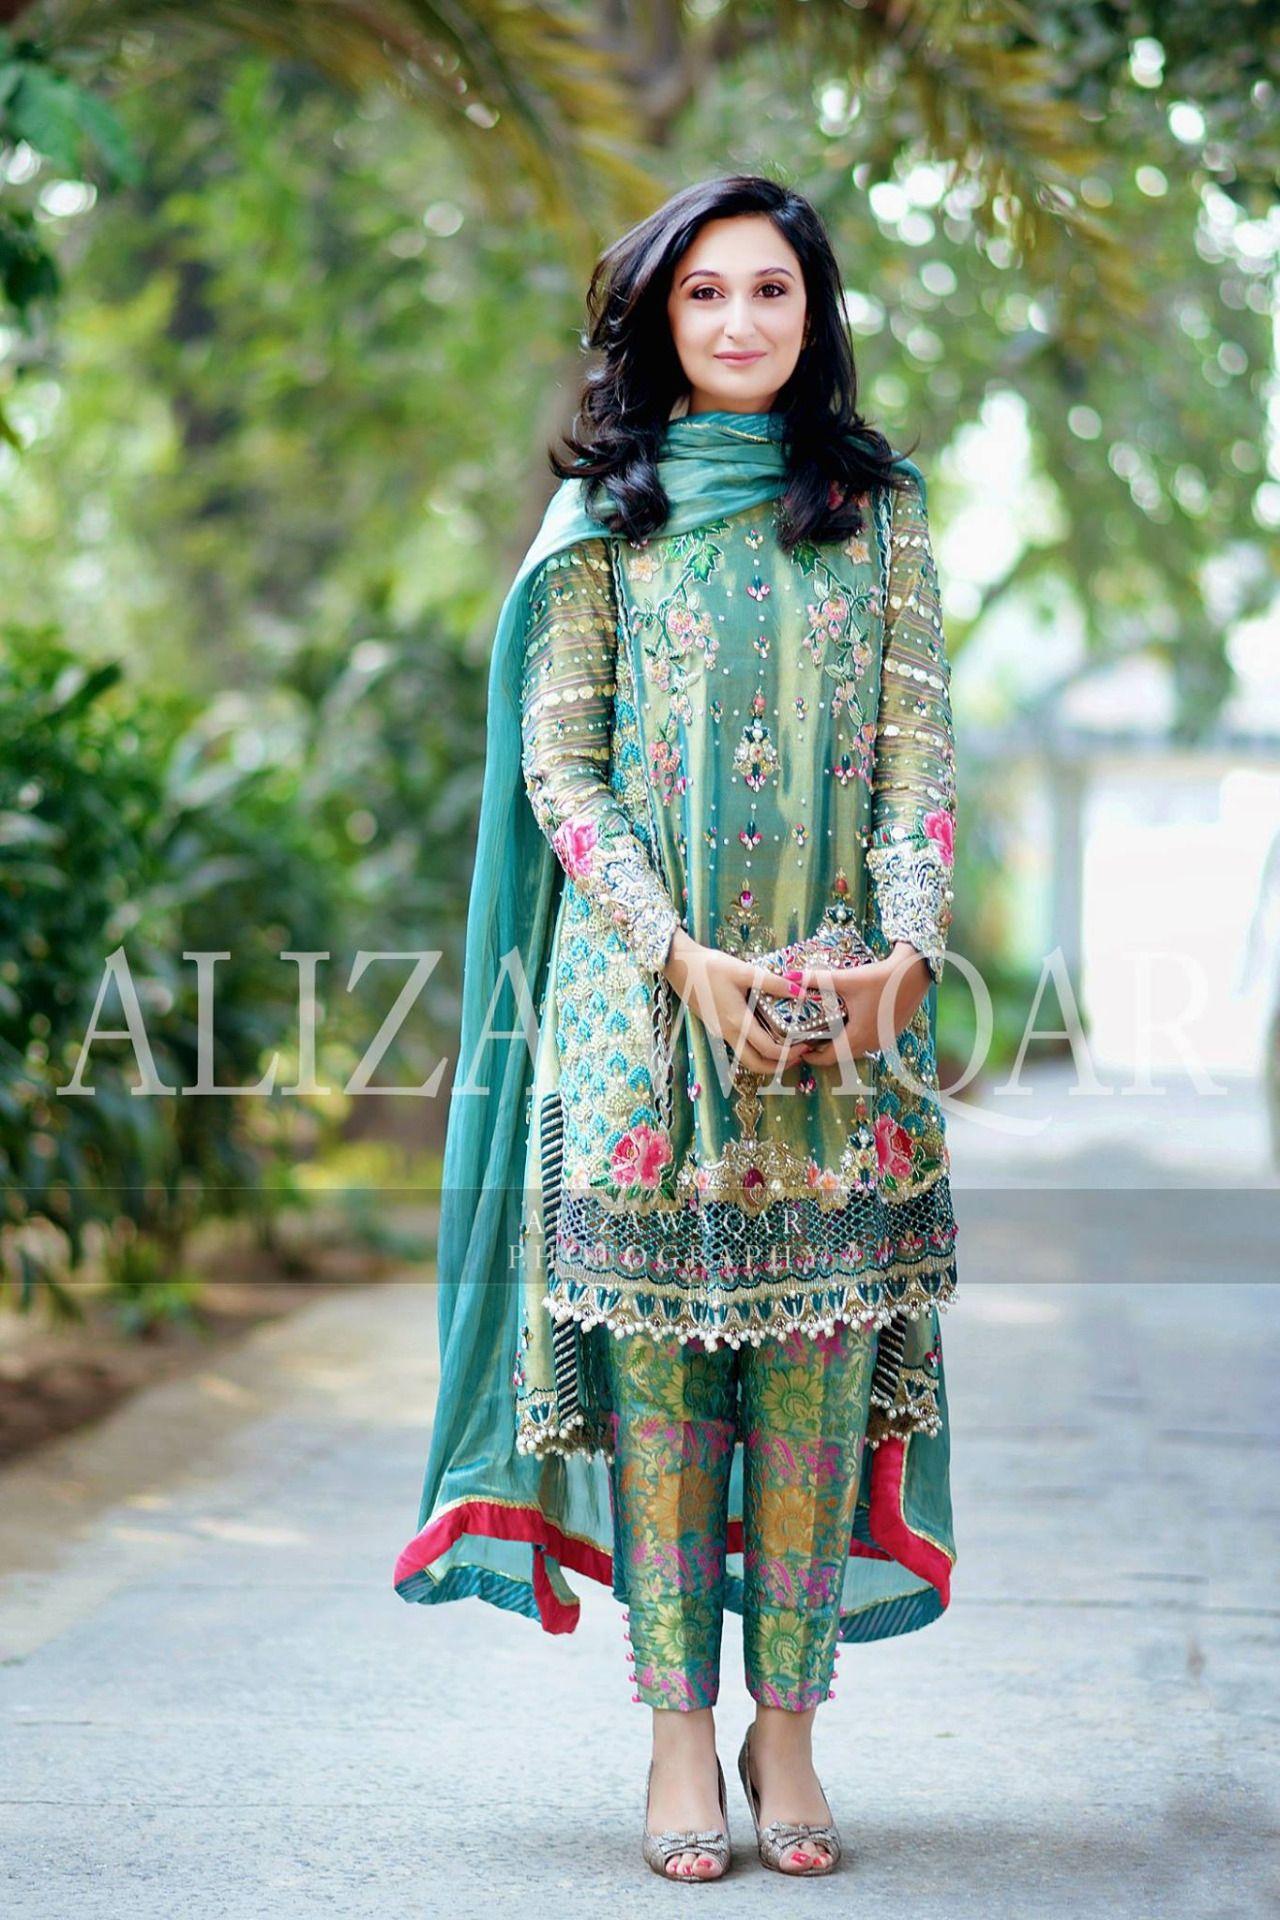 Pak Couture | Pakistani Clothes | Pinterest | Couture, Pakistani and ...